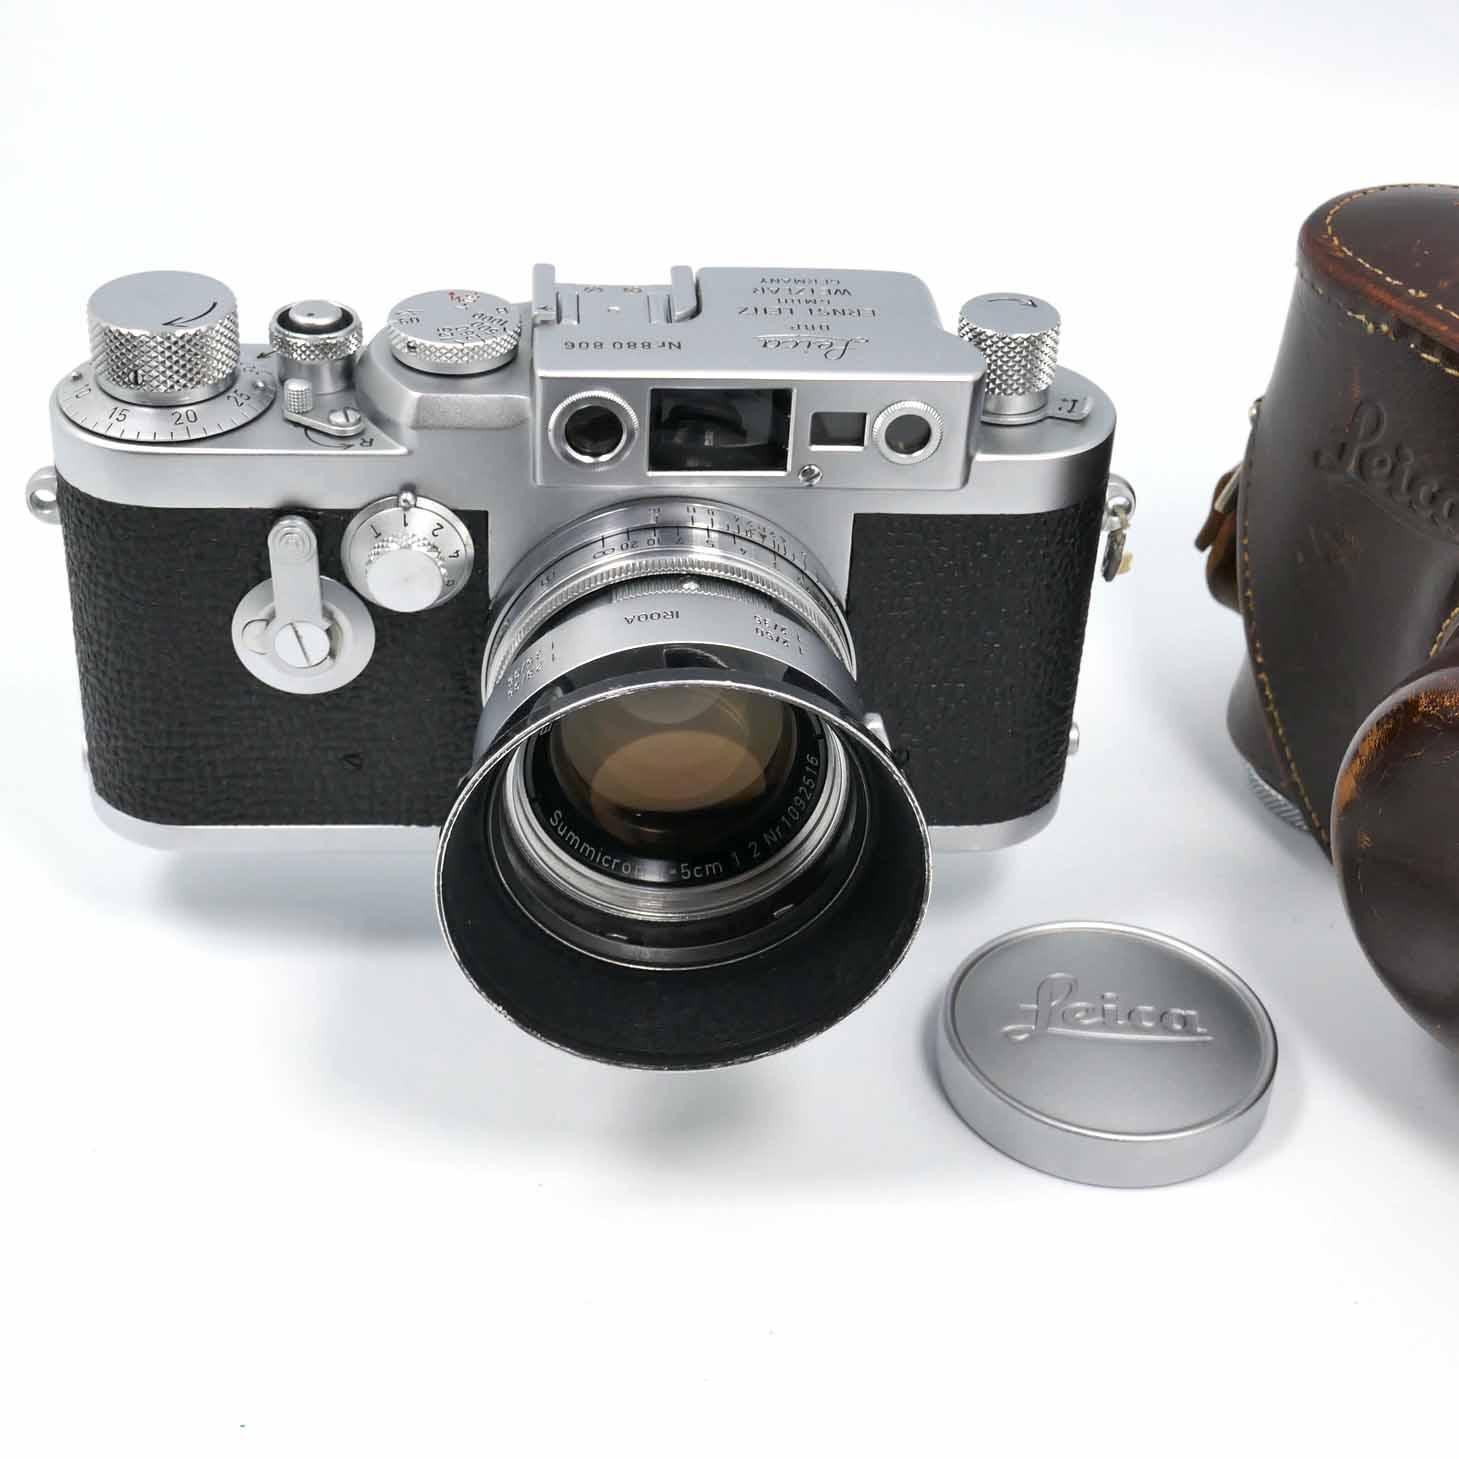 clean-cameras-Leica-IIIg+Summicron-2.0-5cm24